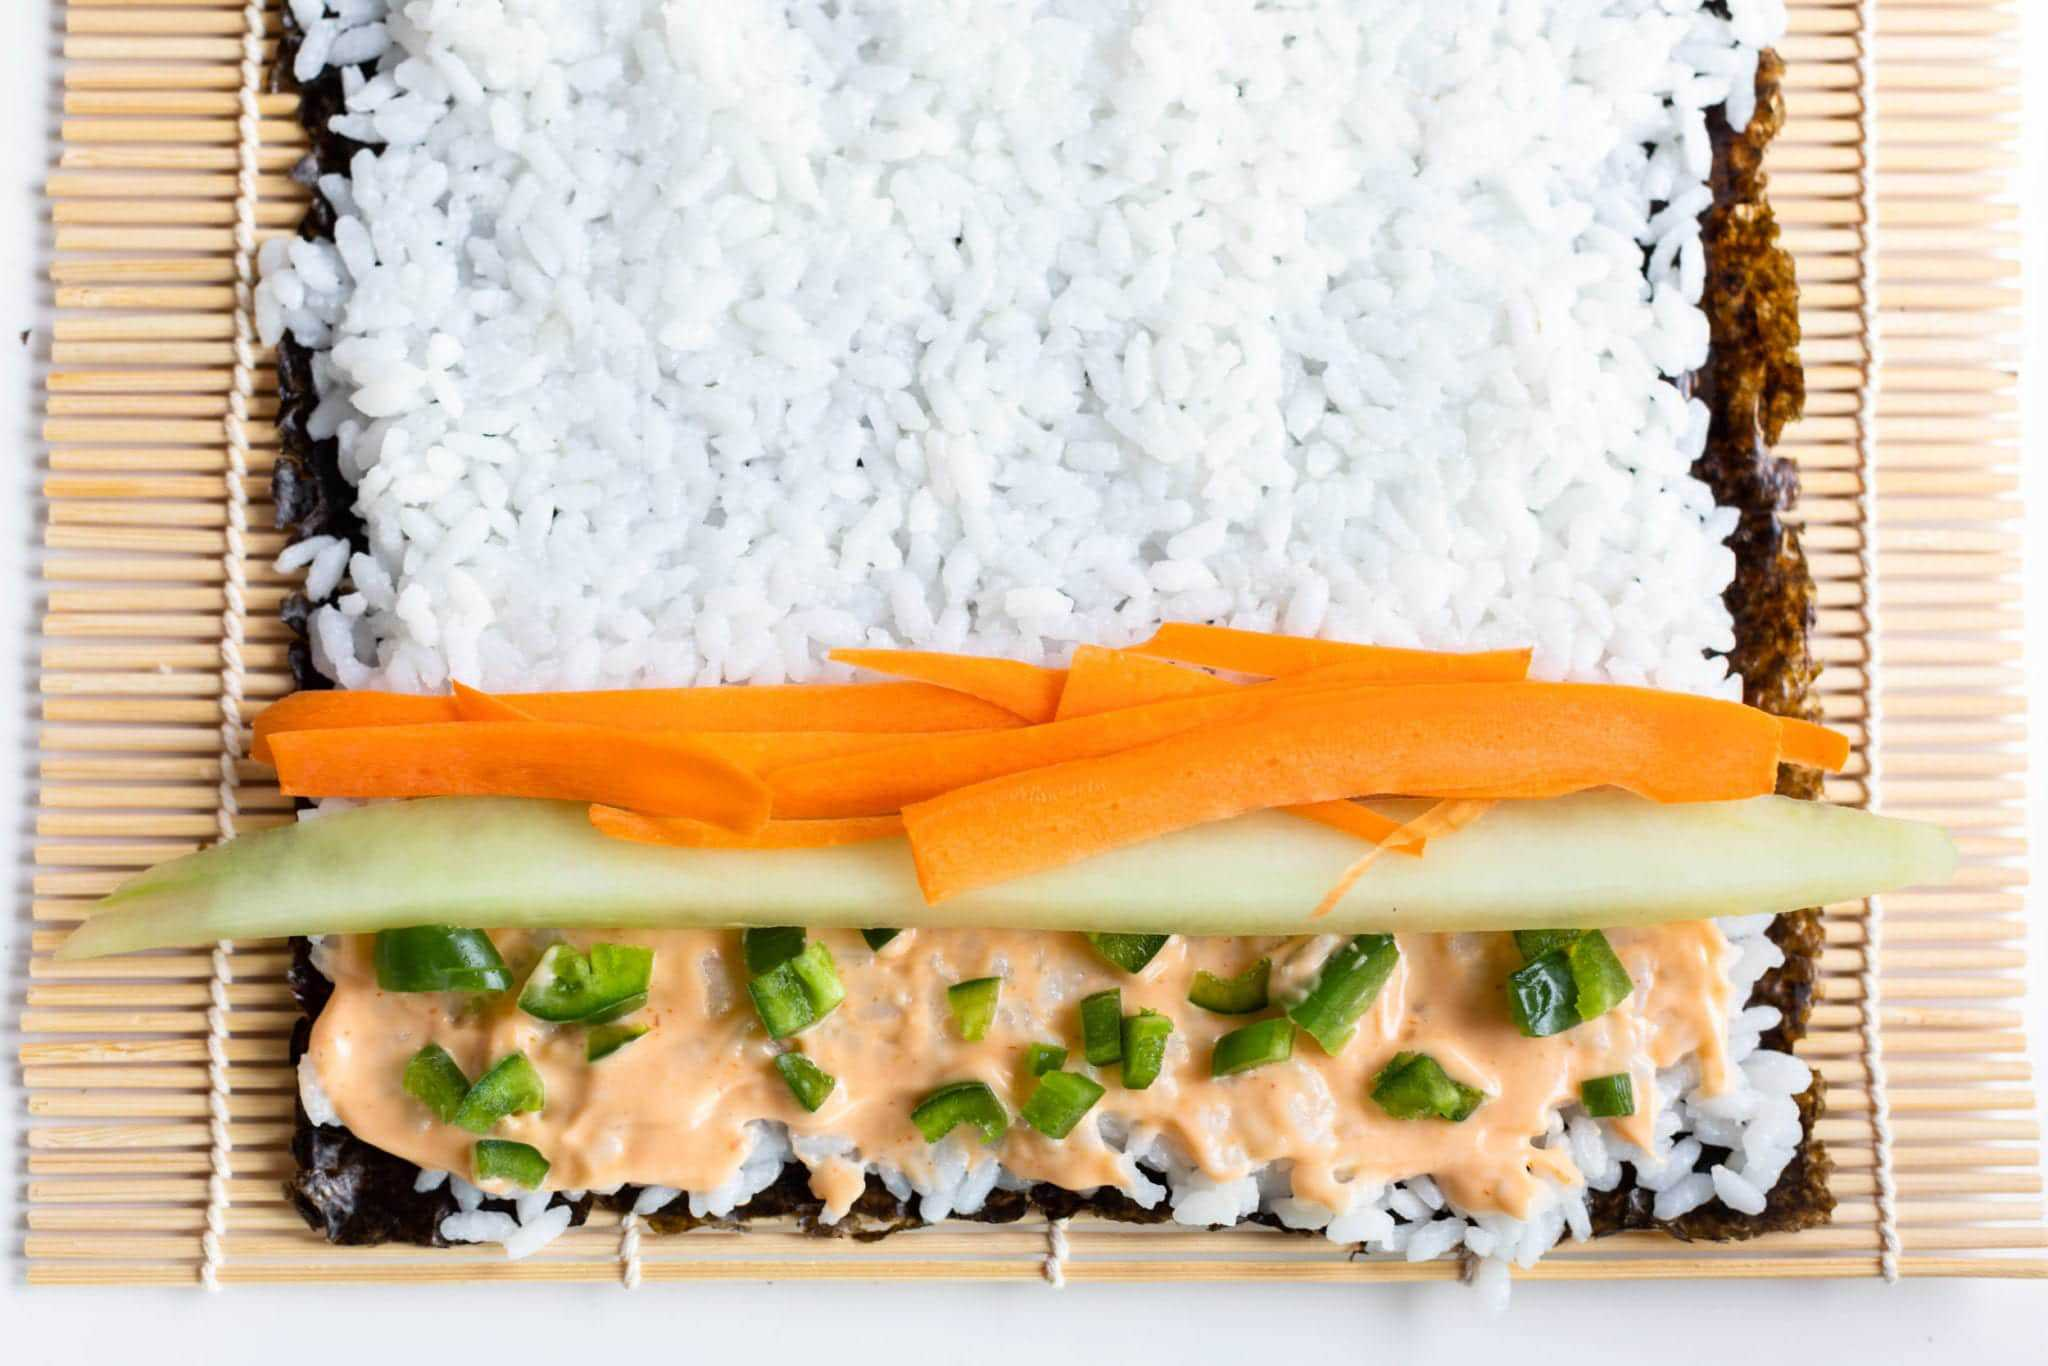 step by step sushi roll bamboo mat, nori, rice with Garlic Sriracha Ailoli, diced jalapeno, cucumber and carrots #sushi #spicytunamaki #sushirecipe #spicytuna #sushirollrecipes #spicytunamaki #crunchyspicytunaroll